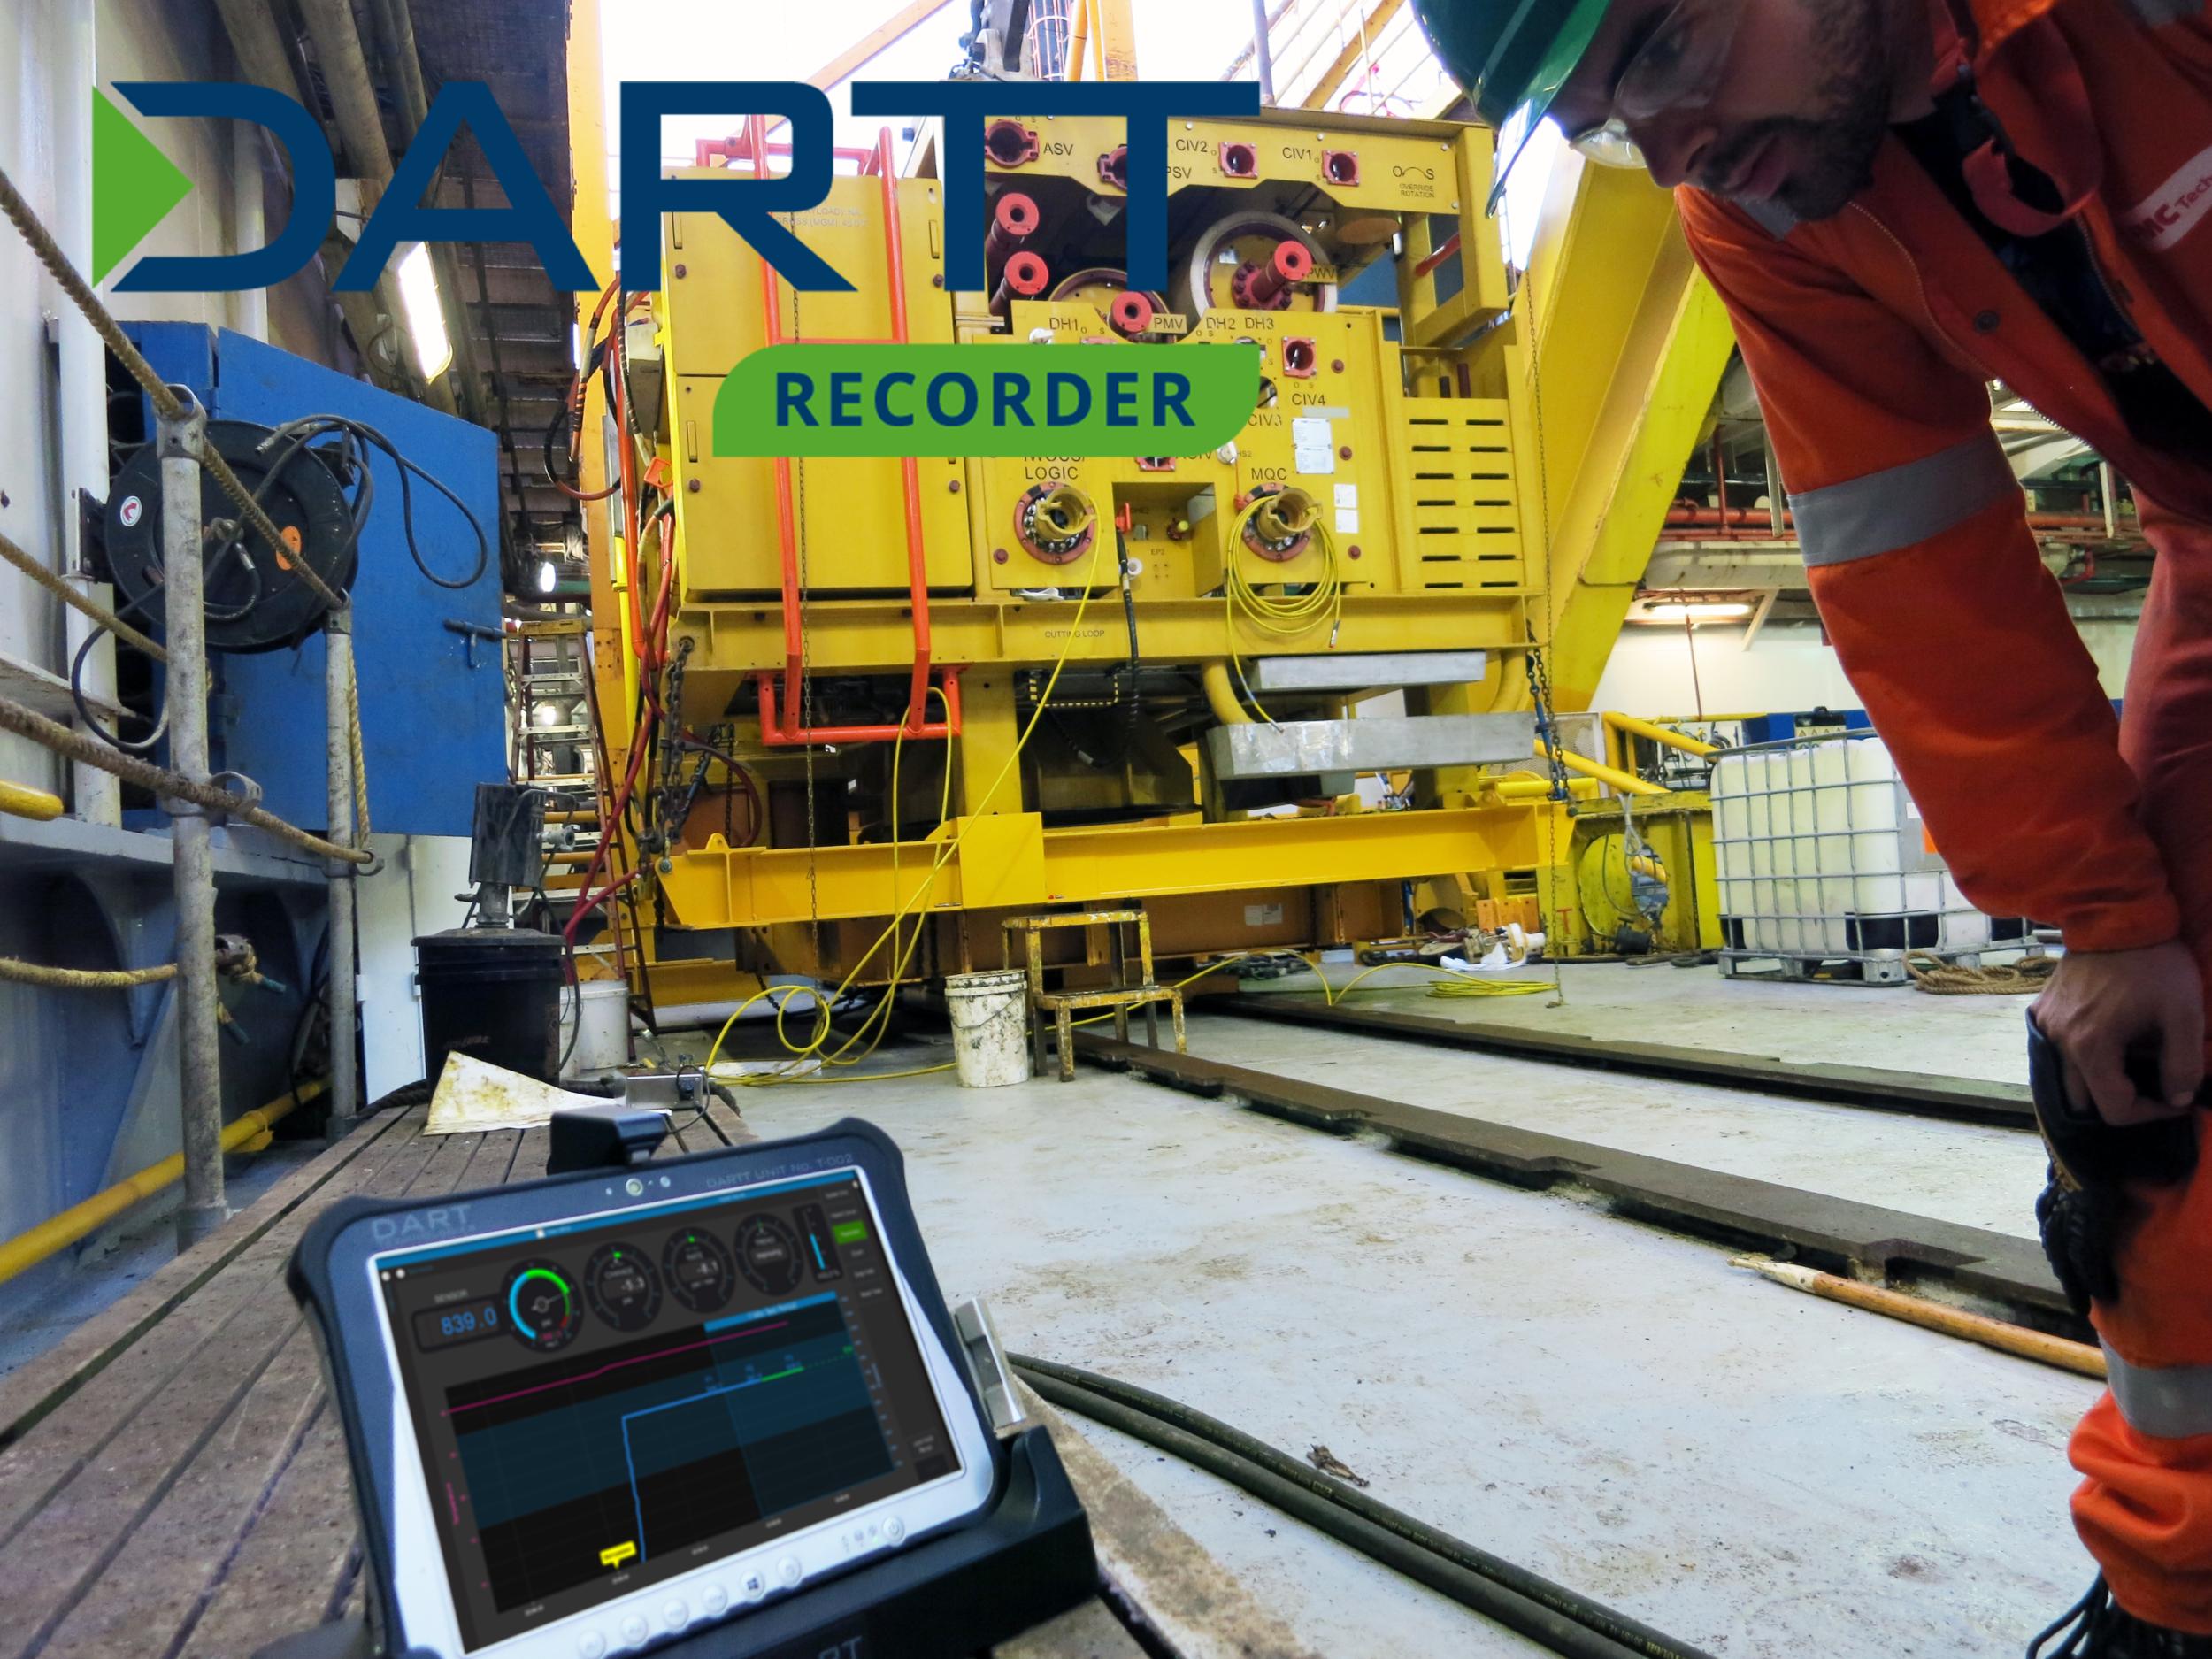 DARTT+Recorder+Subsea+Tree+Pressure+Testing.png